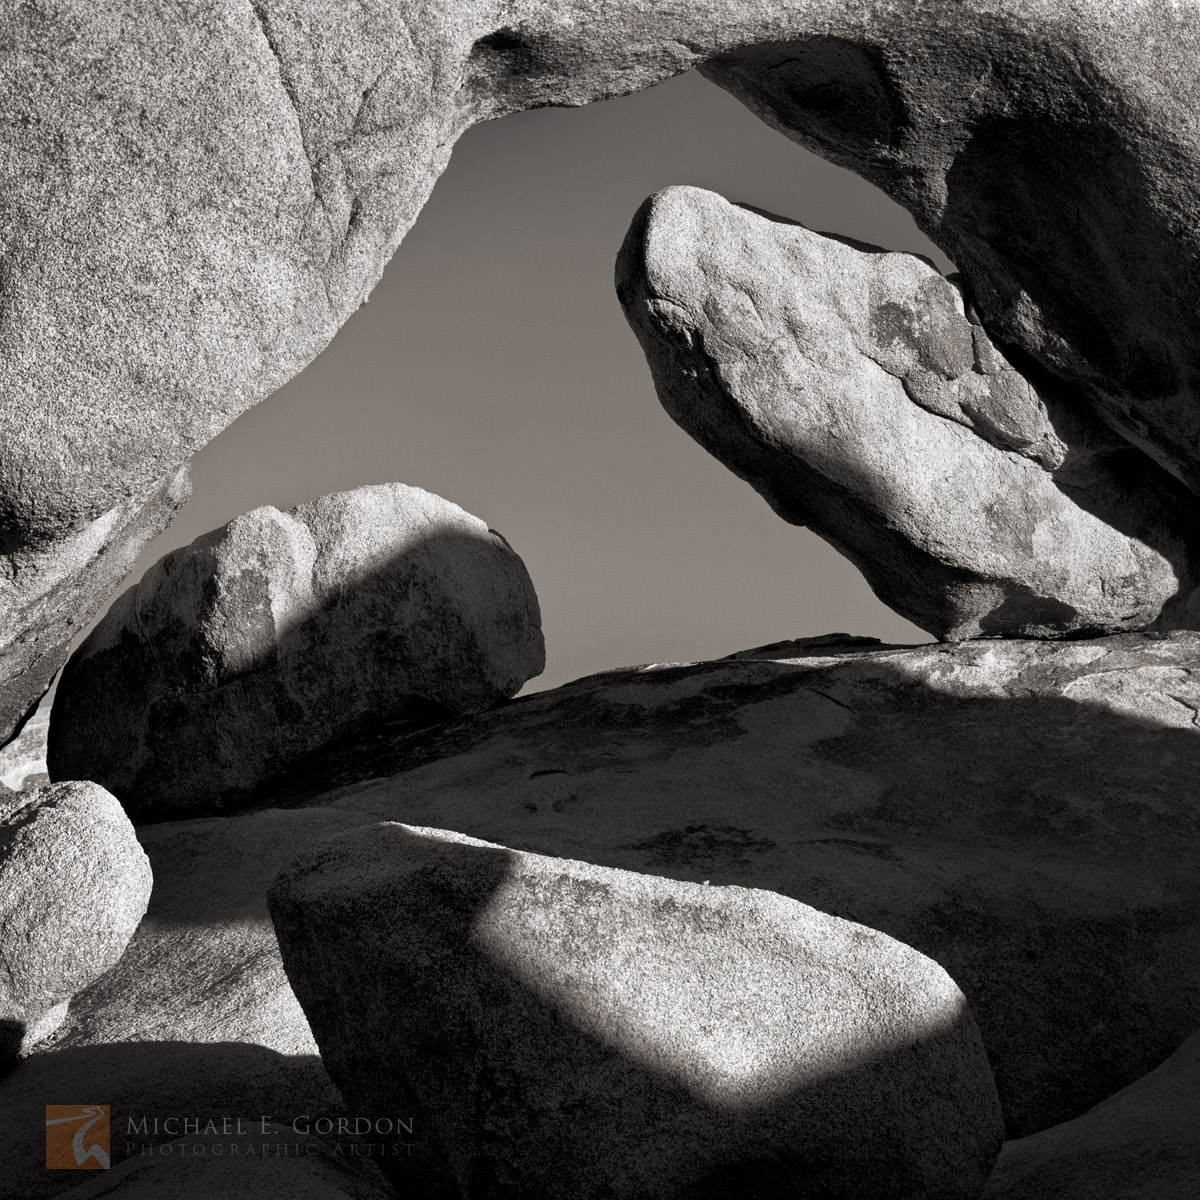 shapes, shadows, Joshua Tree, National Park, California, light, unique, geometry, natural, quartz monozonite, arch, boulders, photo